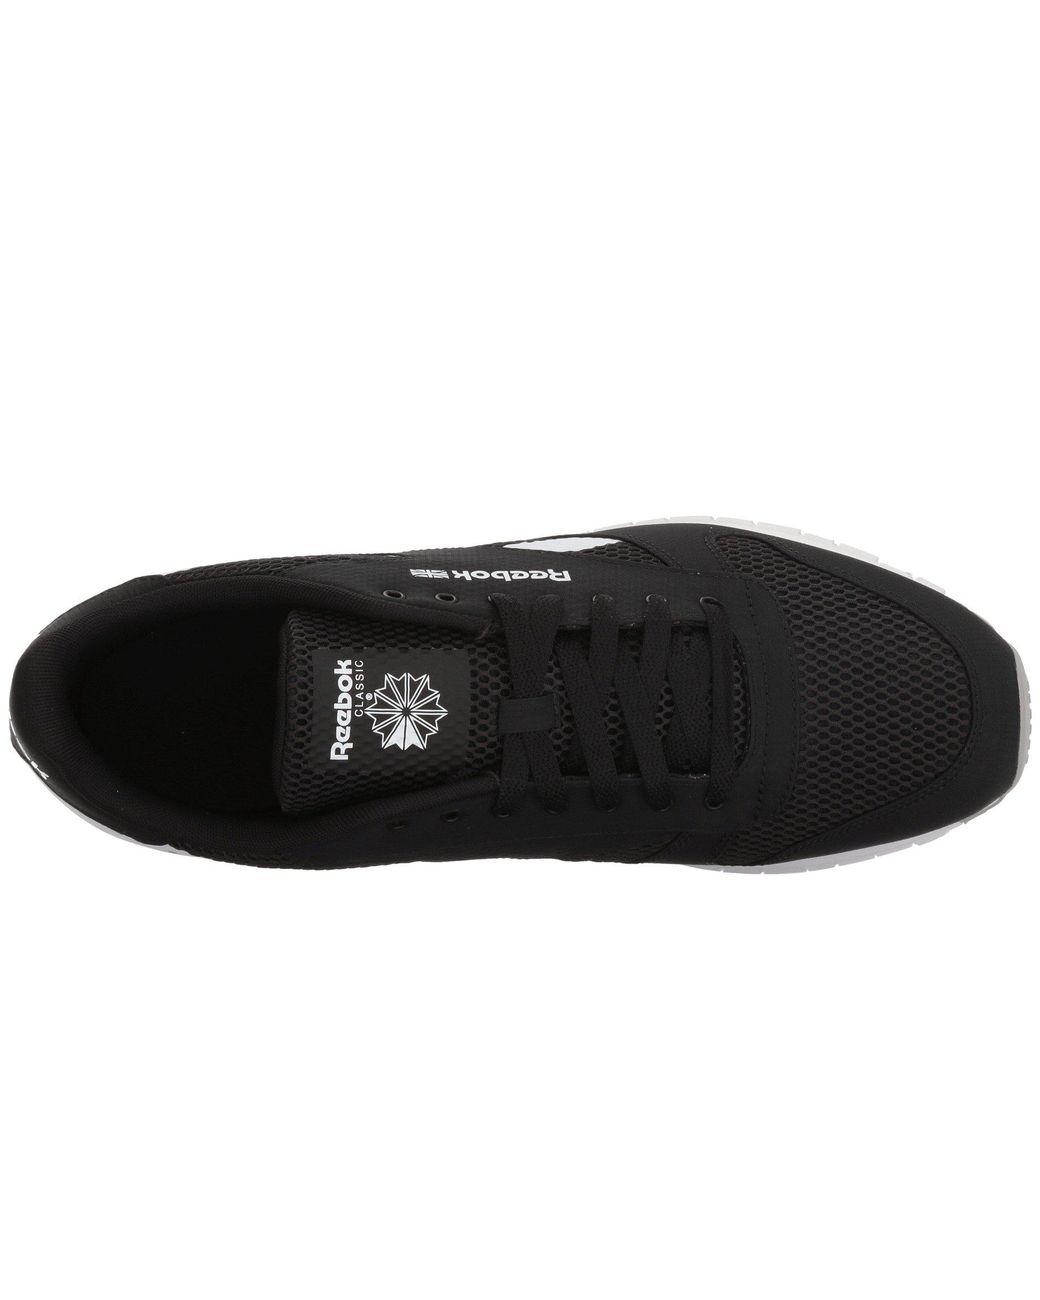 1633edf25847c Lyst - Reebok Classic Leather Mvs (black stark Grey white) Men s Classic  Shoes in Black for Men - Save 64%